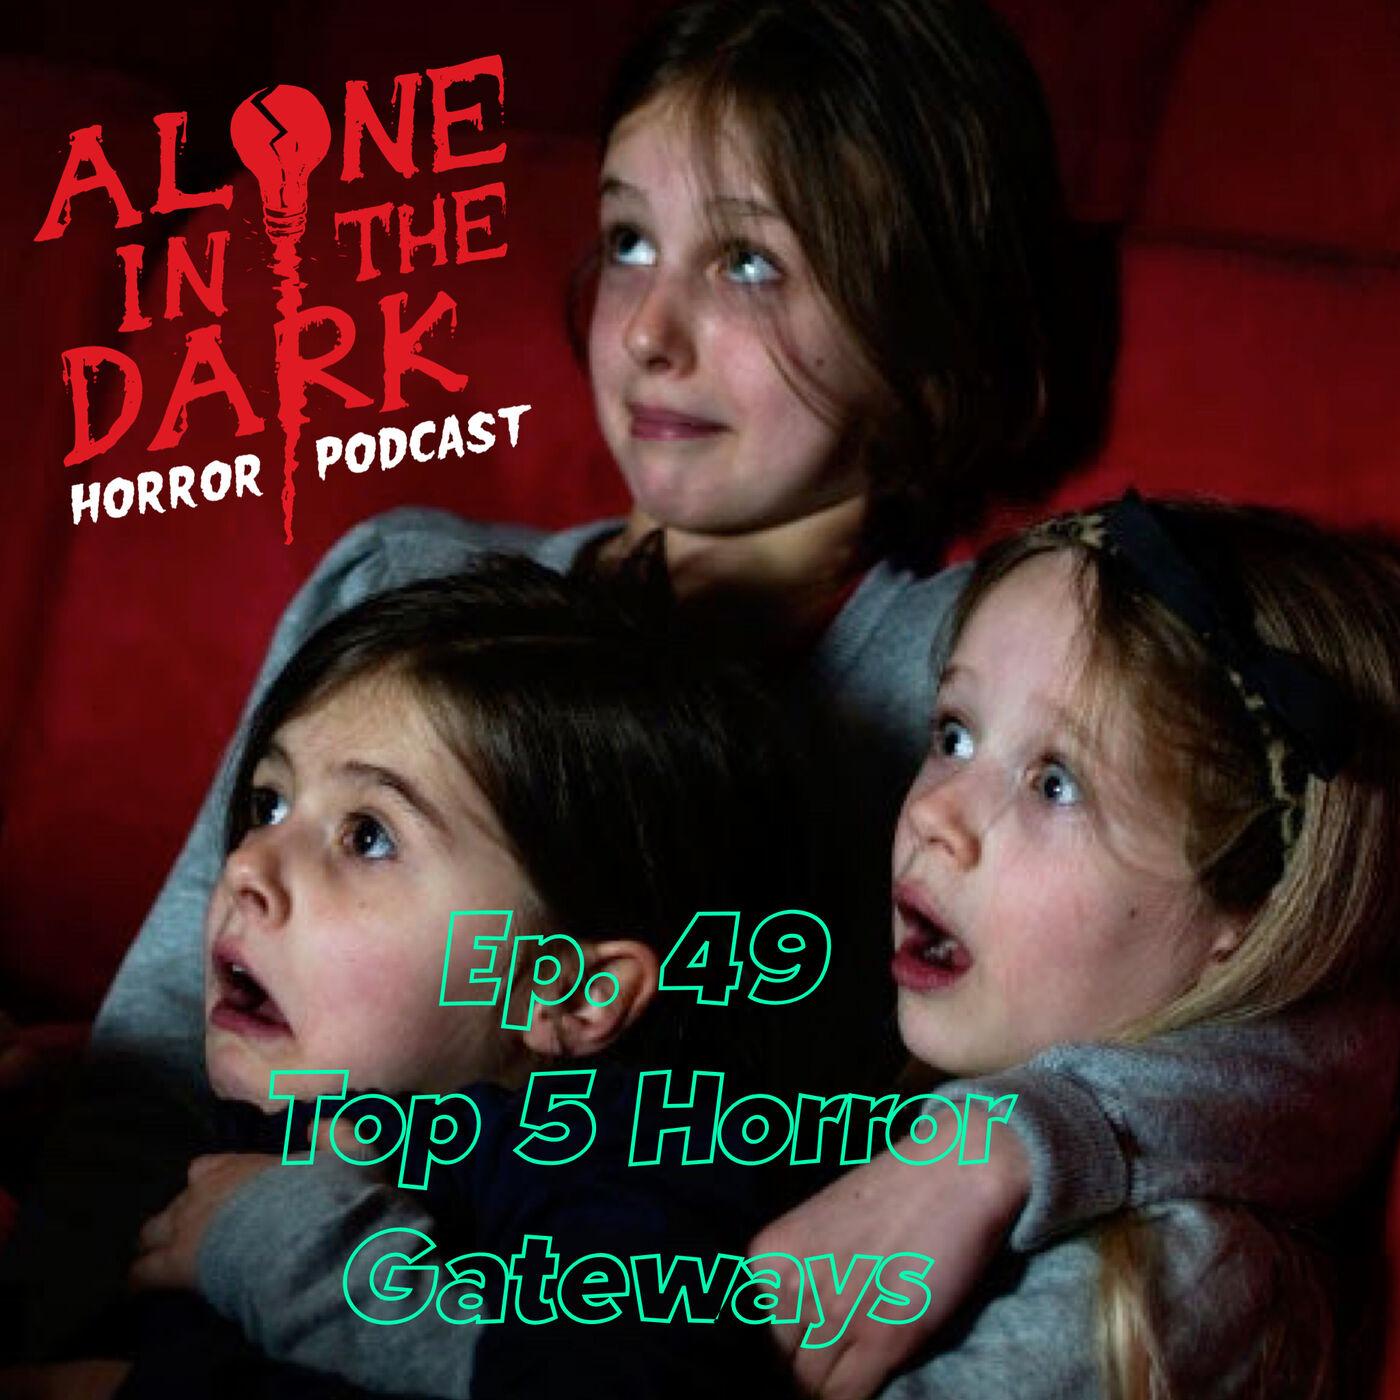 Ep. 49 Top 5 Horror Gateways